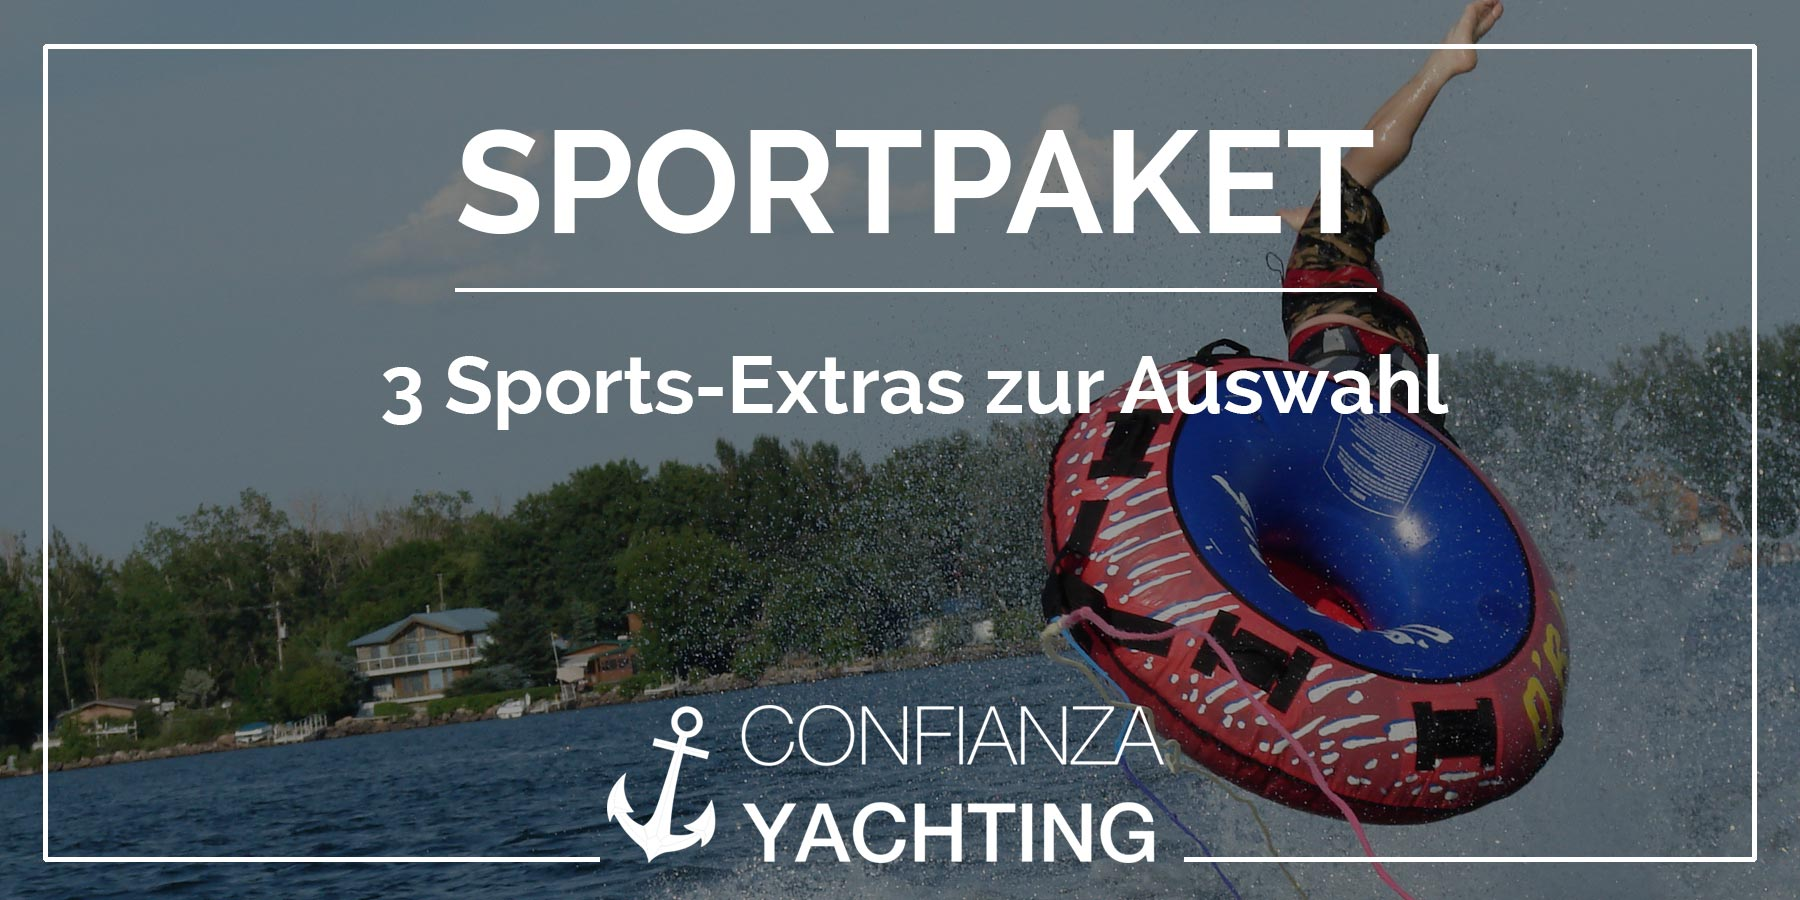 Sportpaket